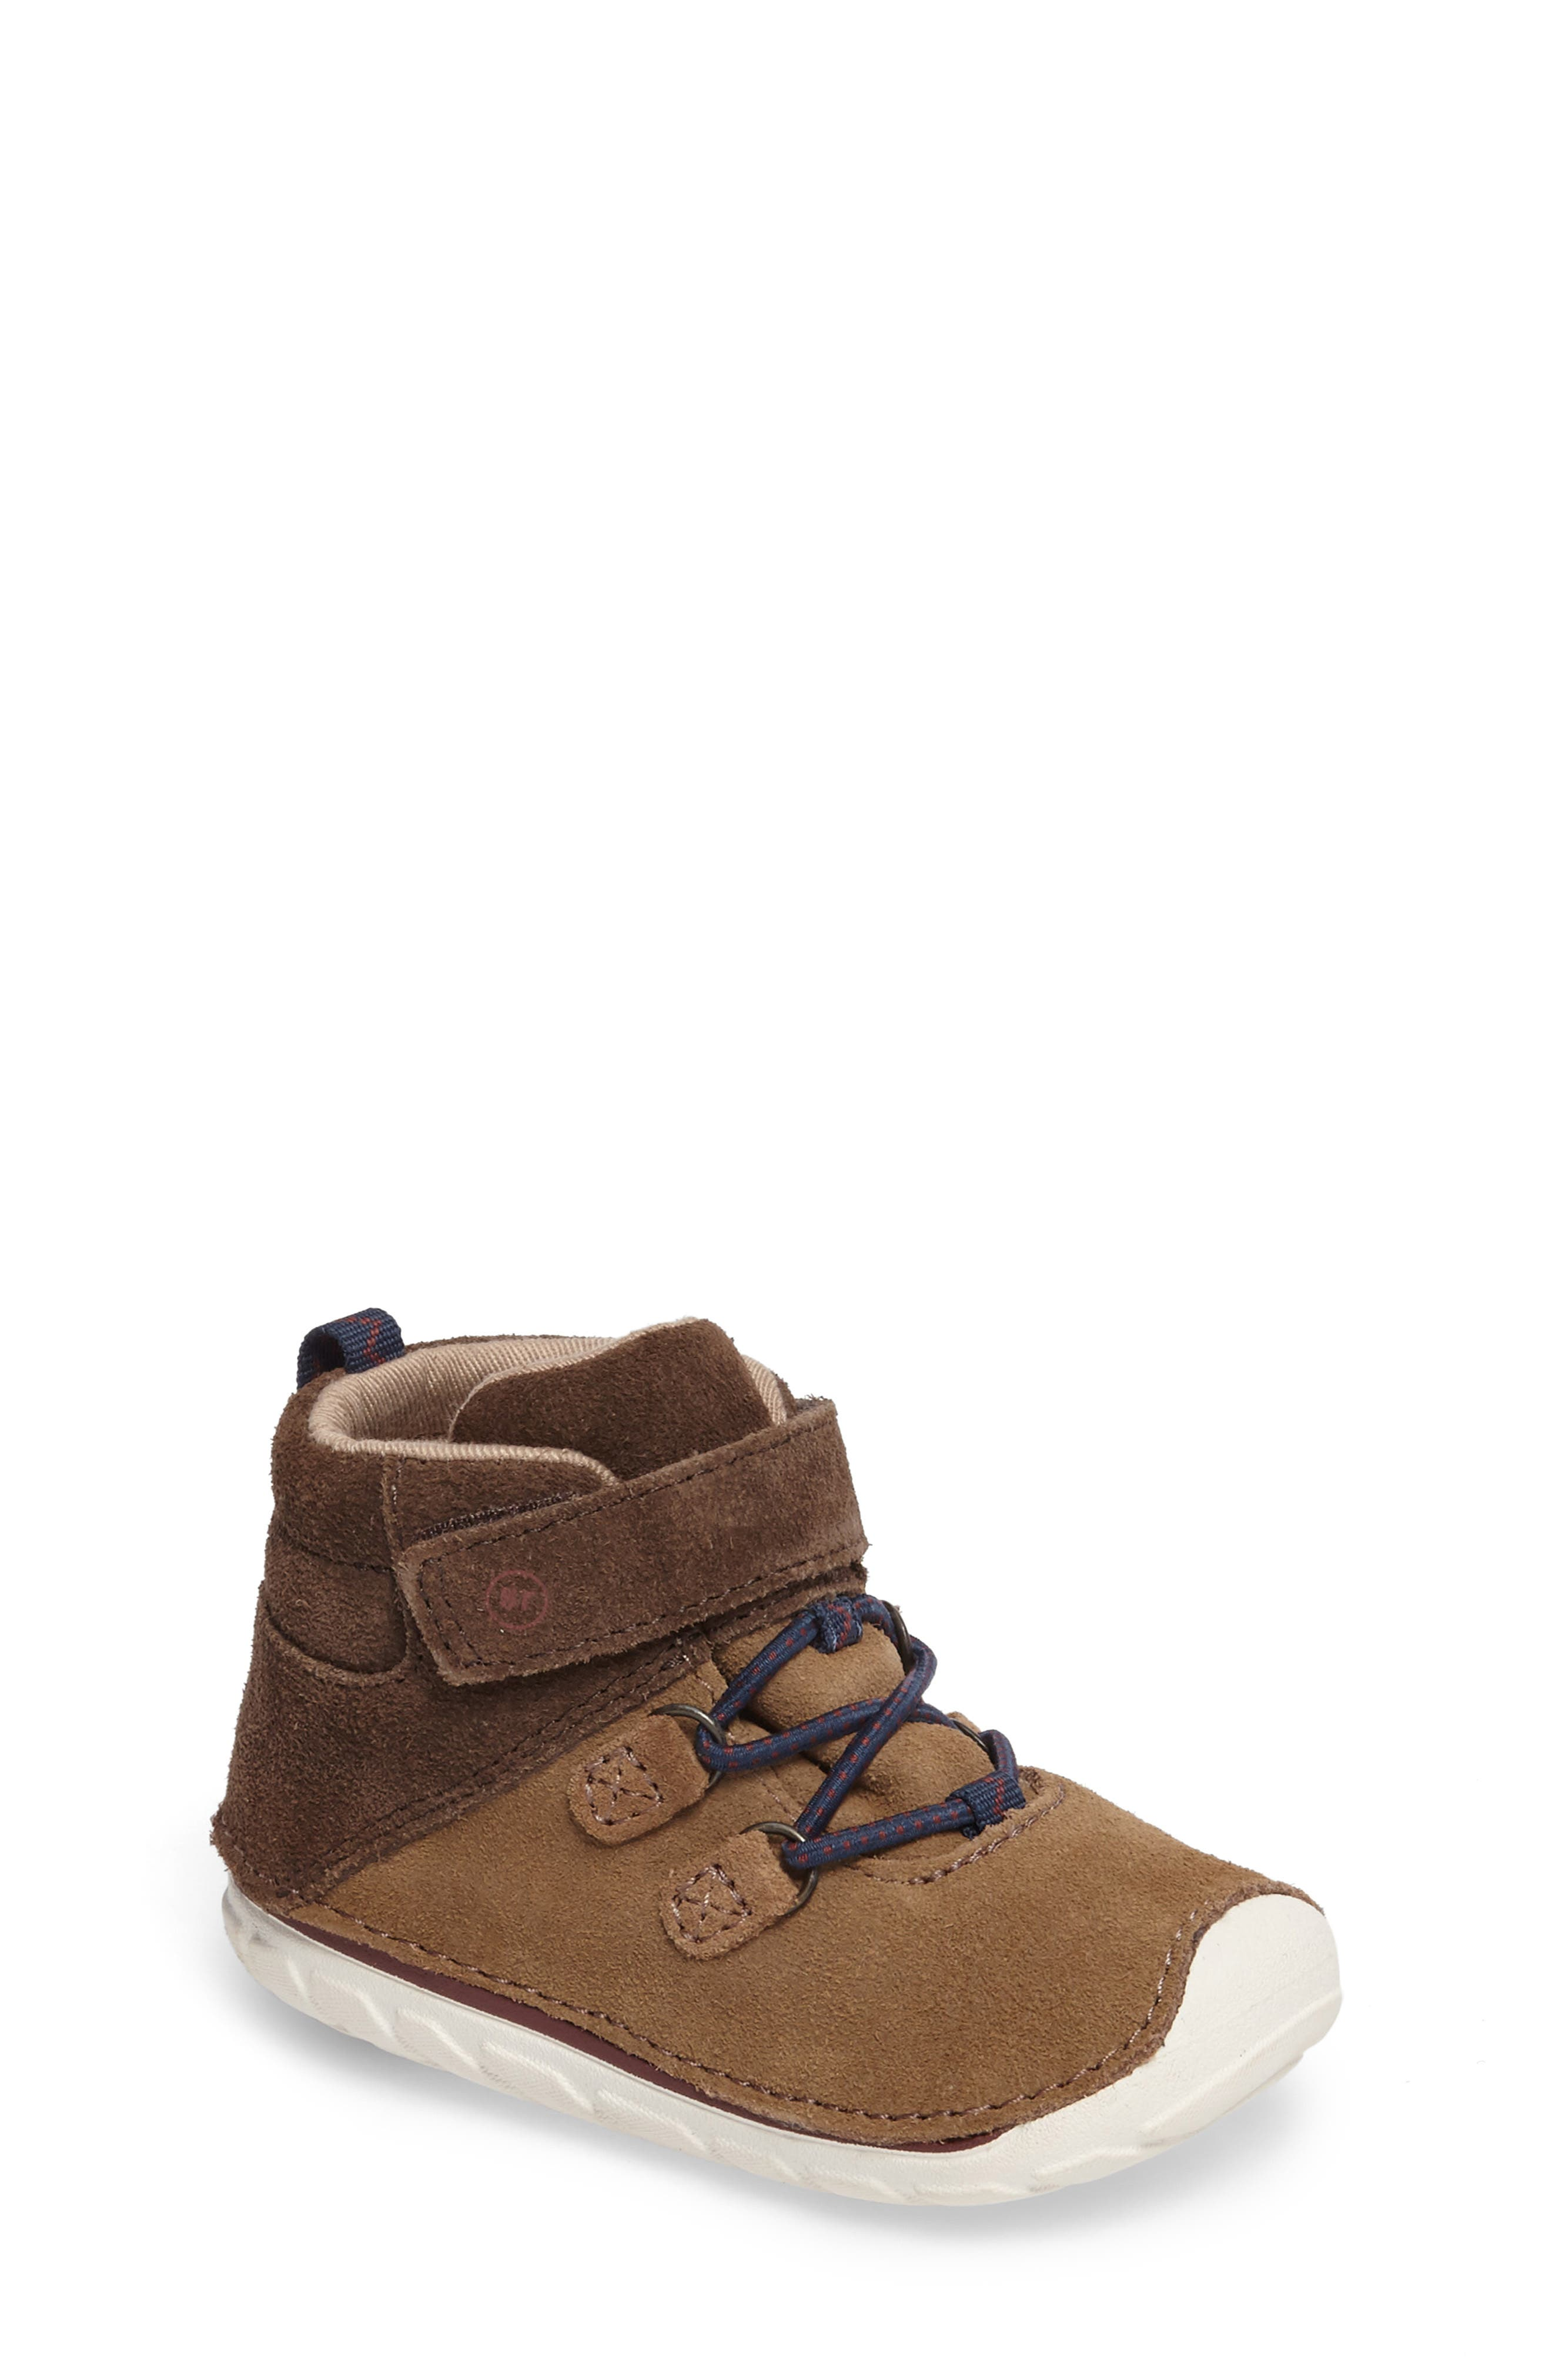 Stride Rite Soft Motion™ Oliver High Top Sneaker (Baby & Walker)